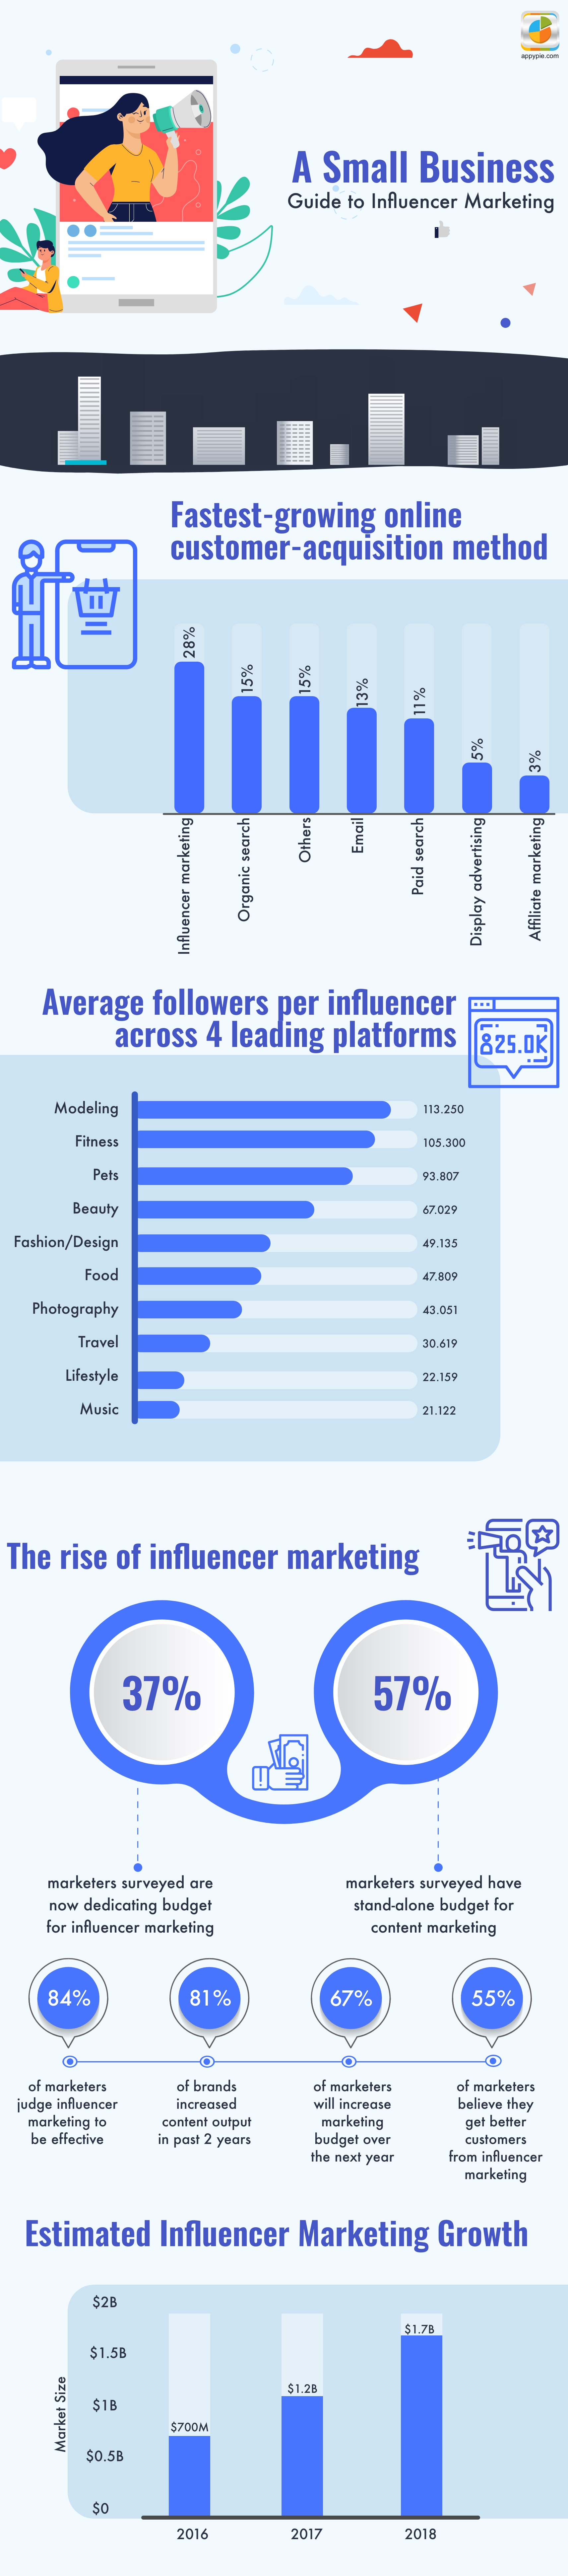 Myths associated with Influencer Marketing